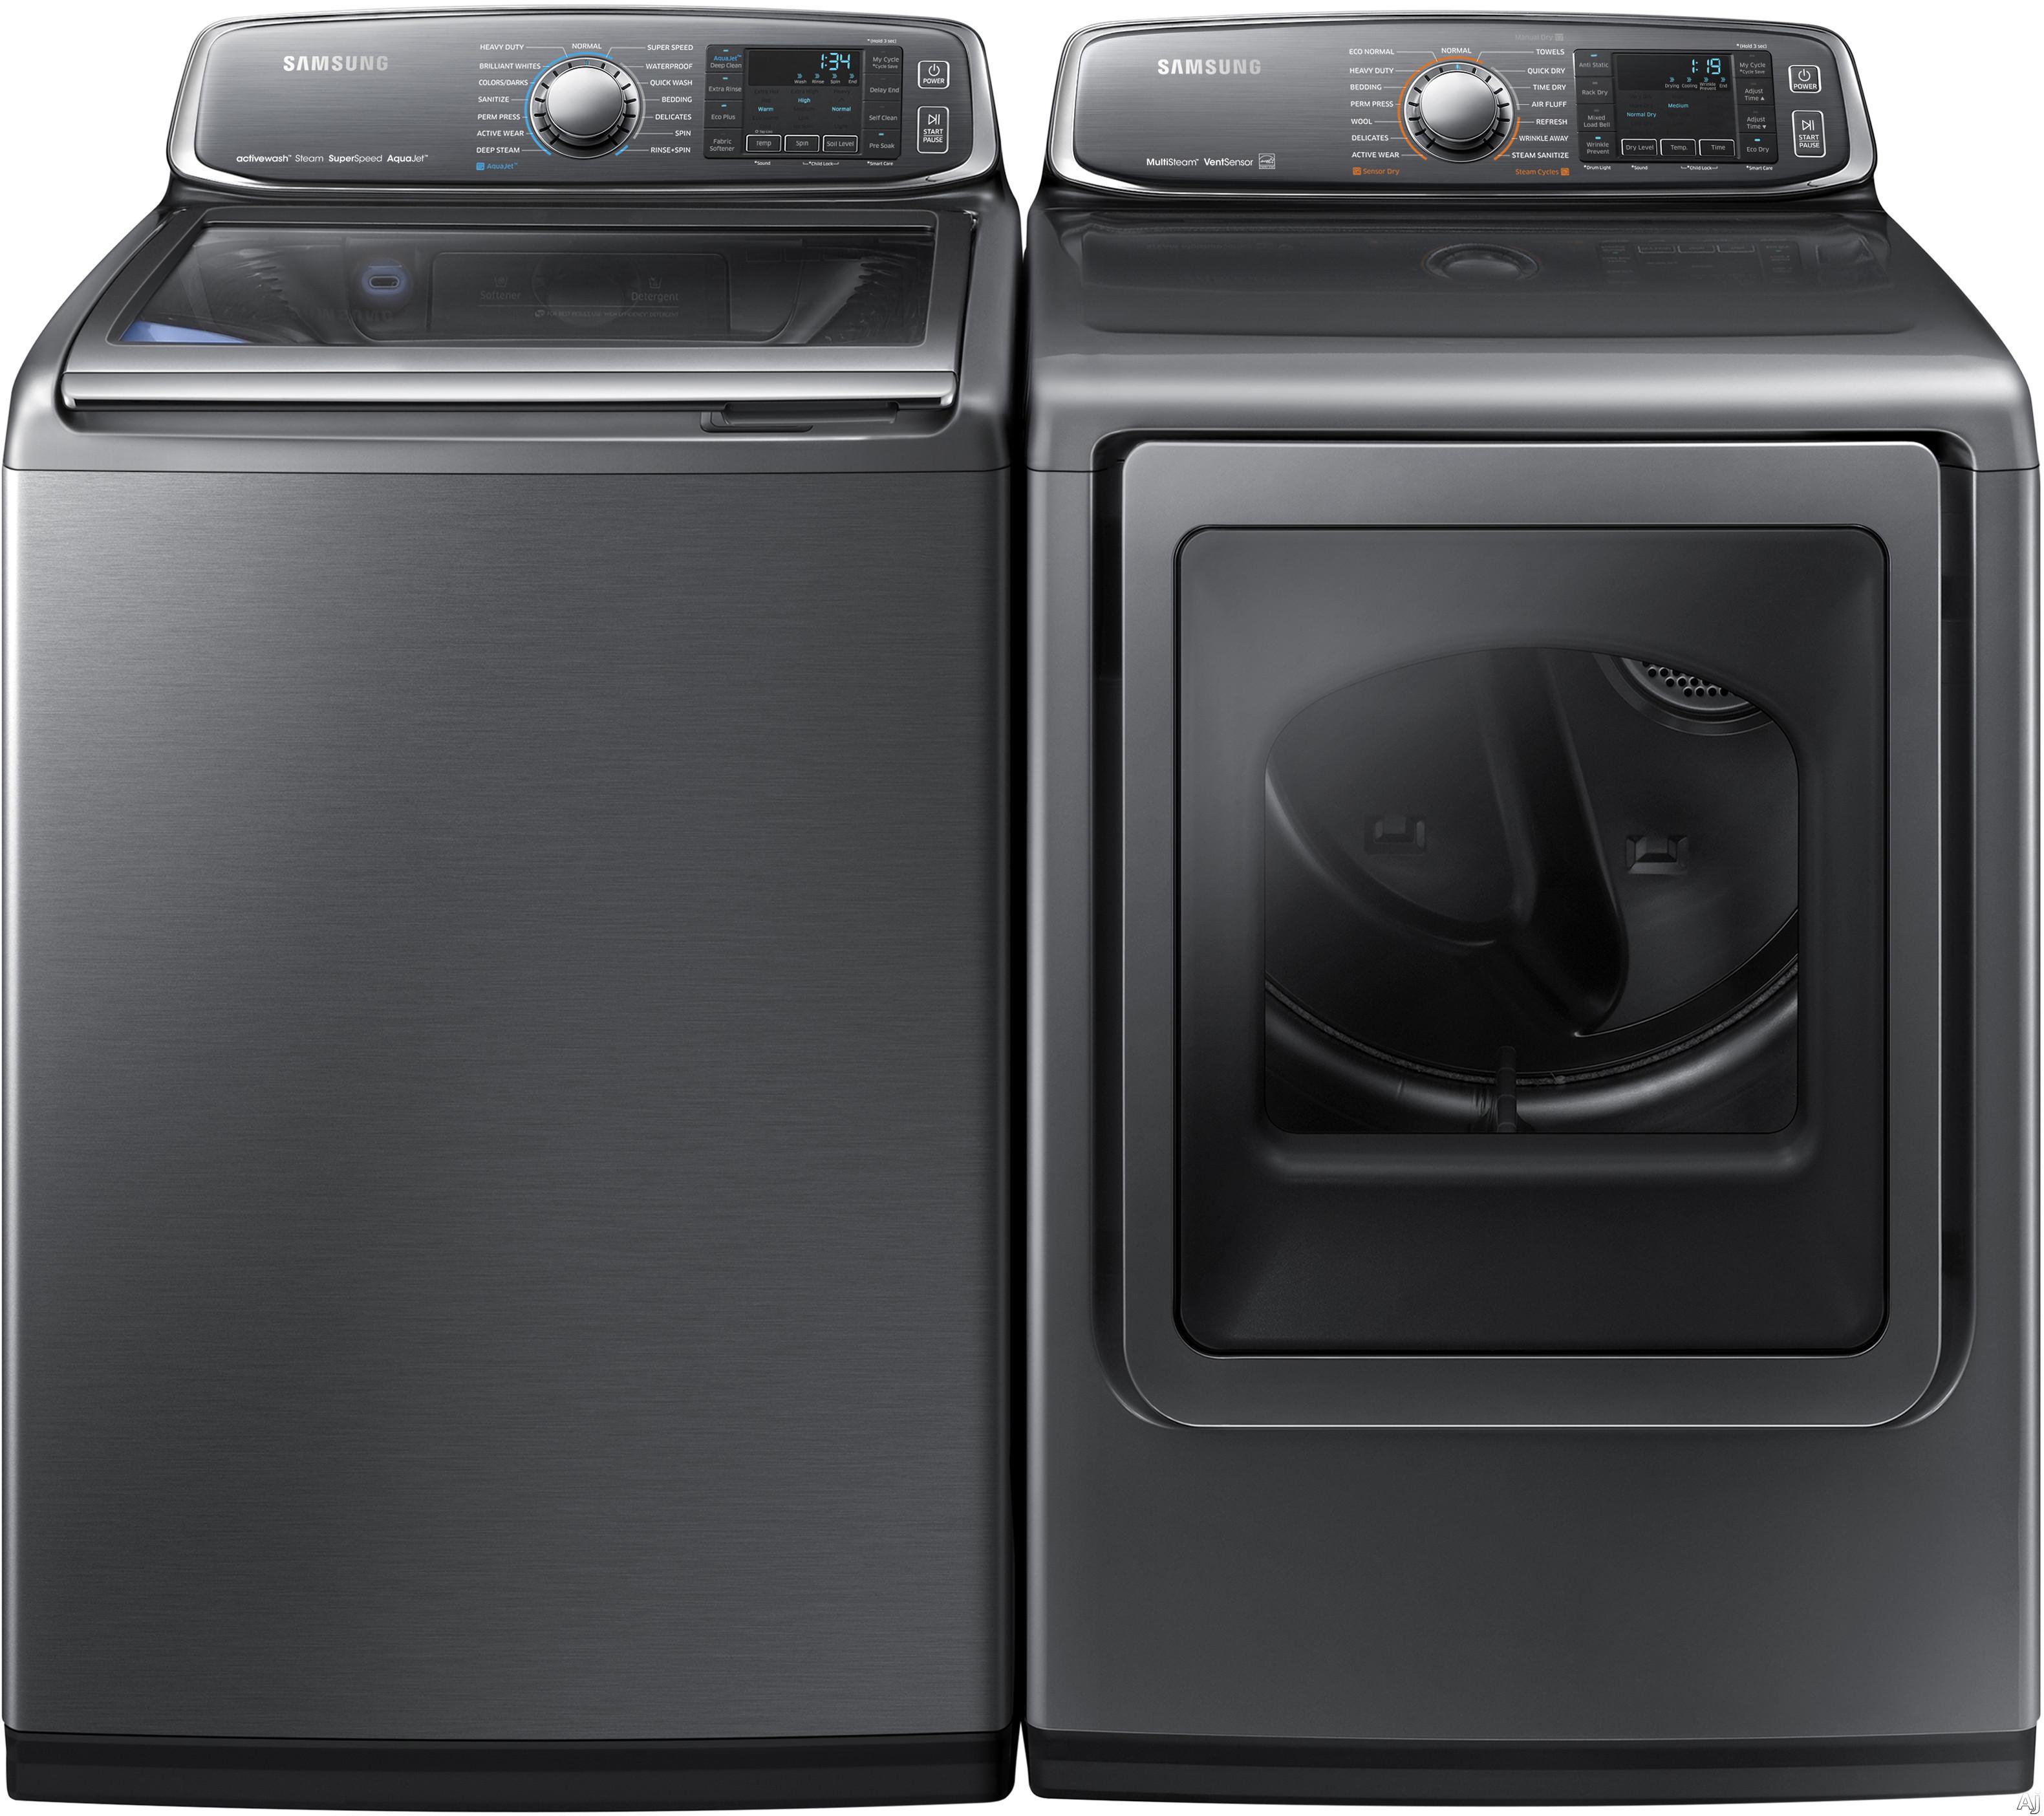 Samsung Sam8700tl Samsung 8700 Series Top Load Washer